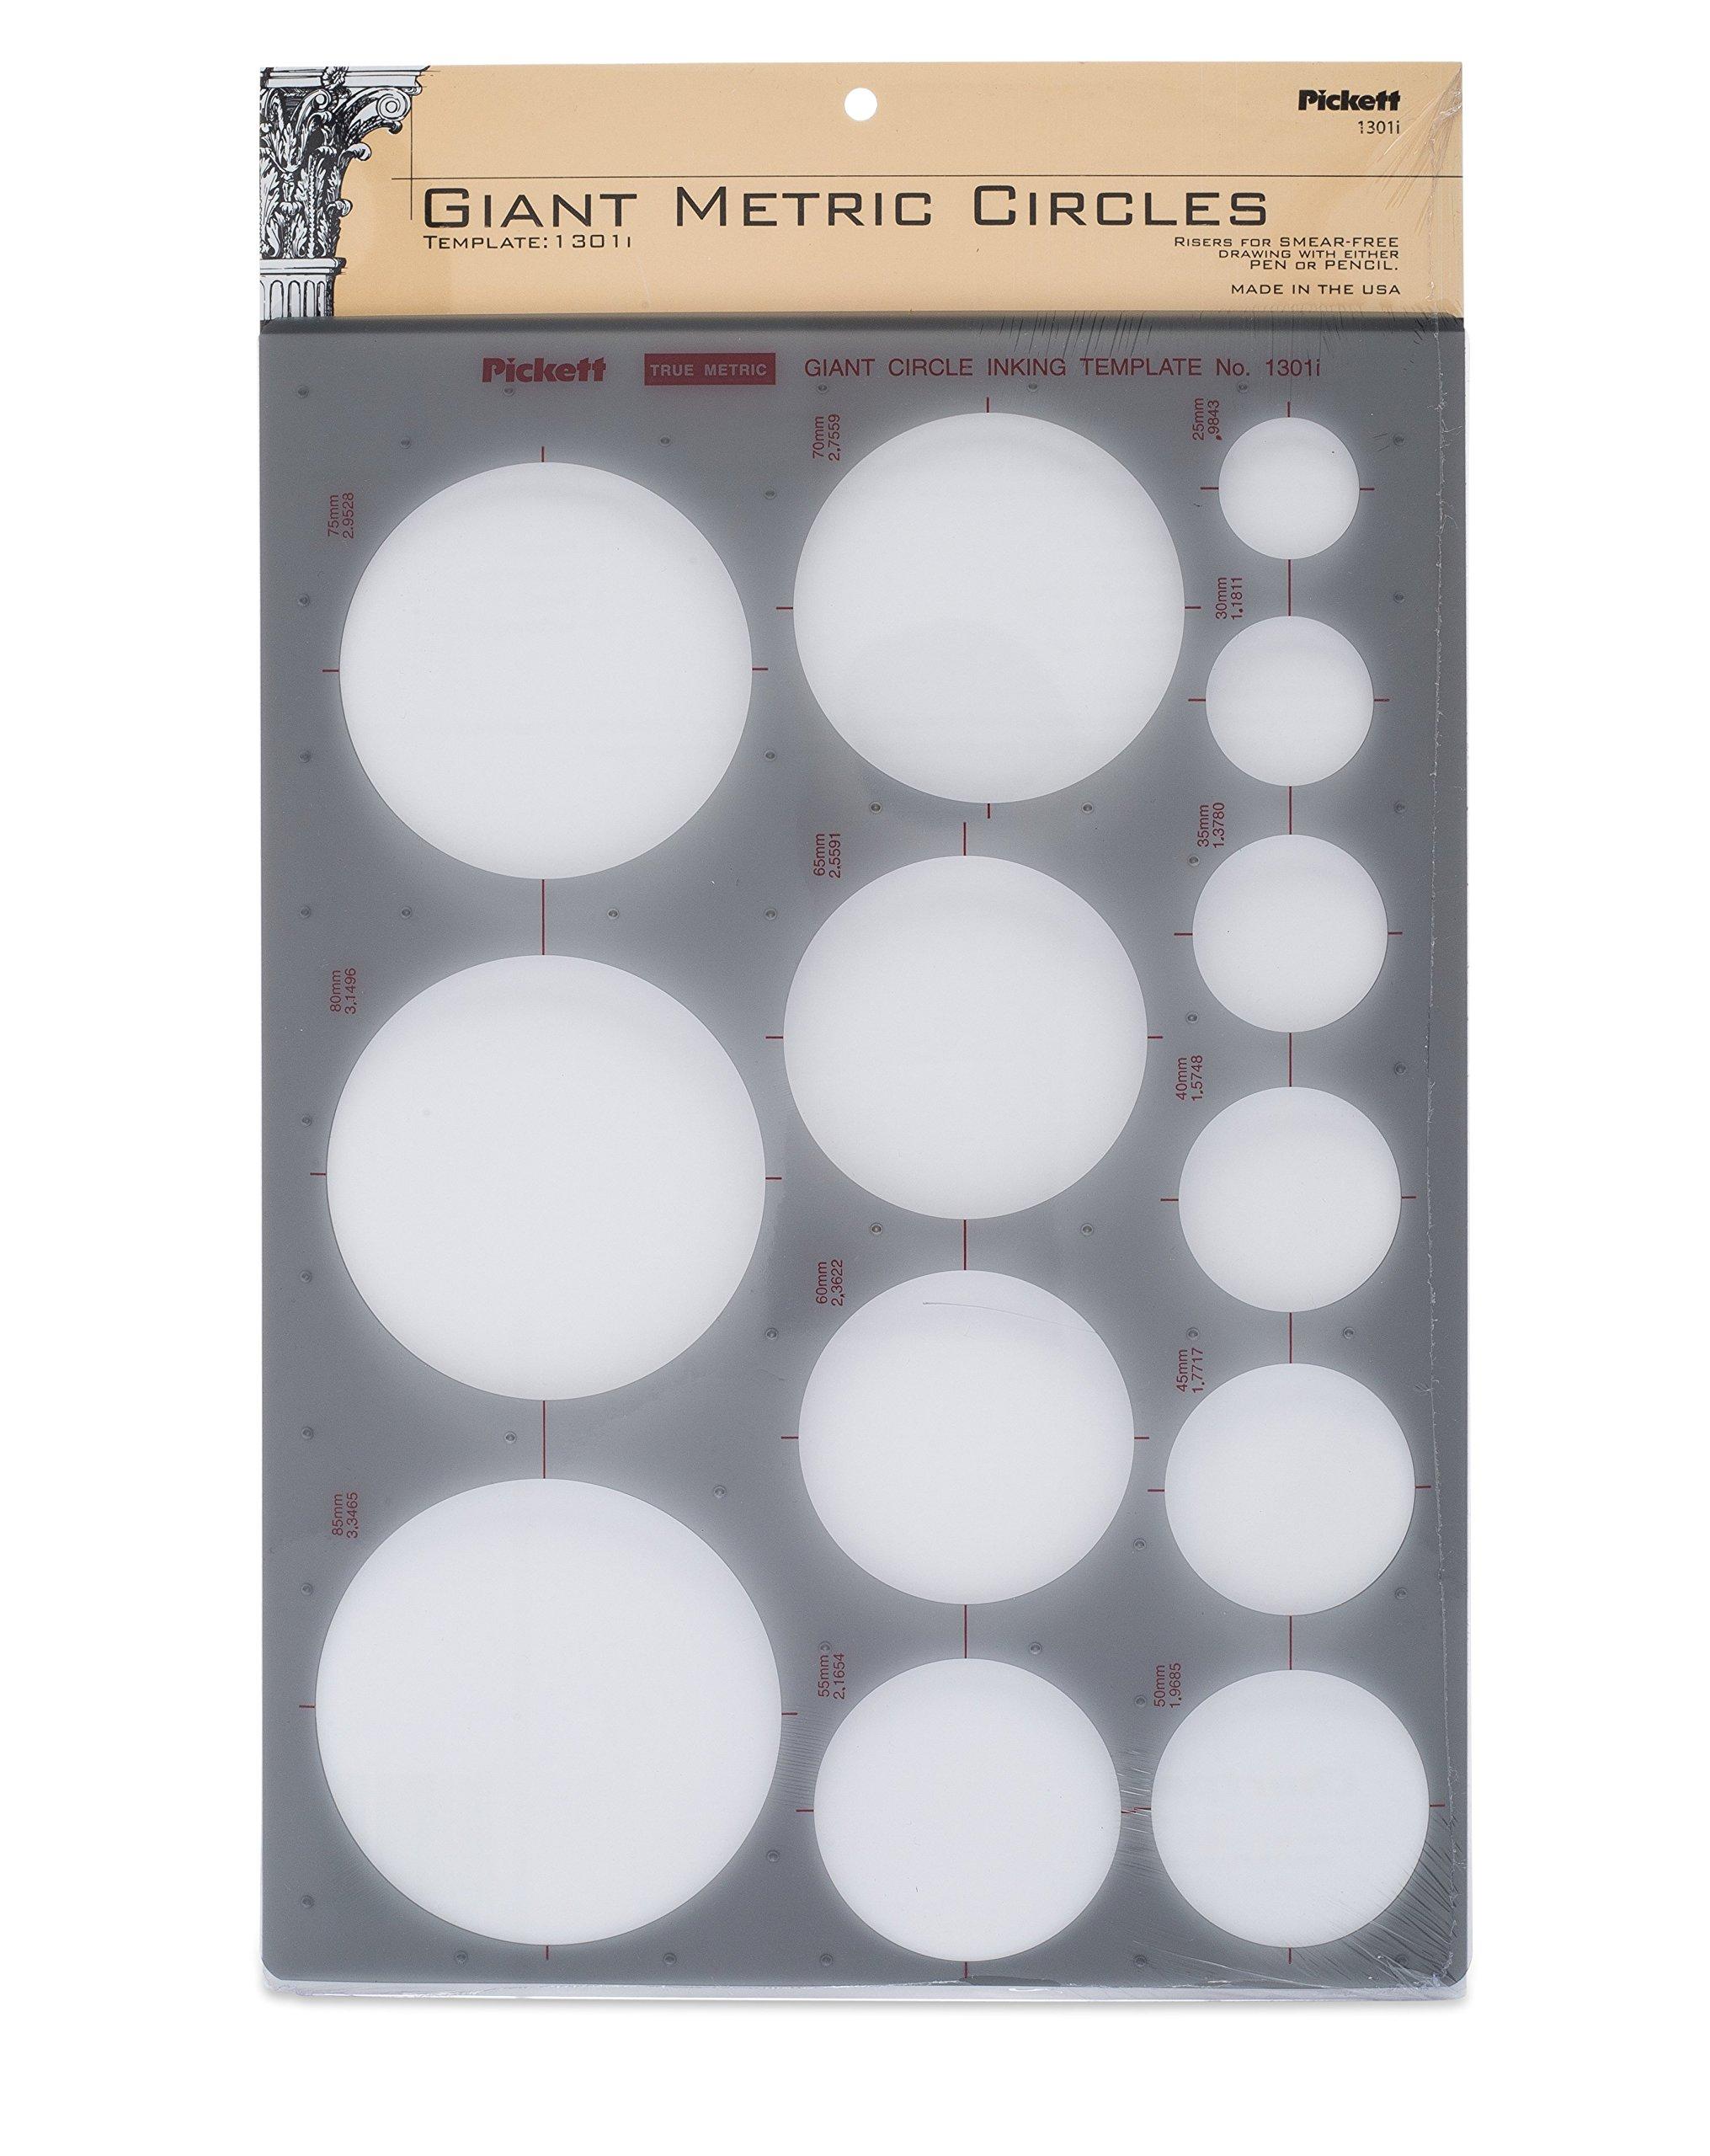 Pickett Giant Metric Circles Template, Circle Range 25mm to 85mm in Diameter (1301I)